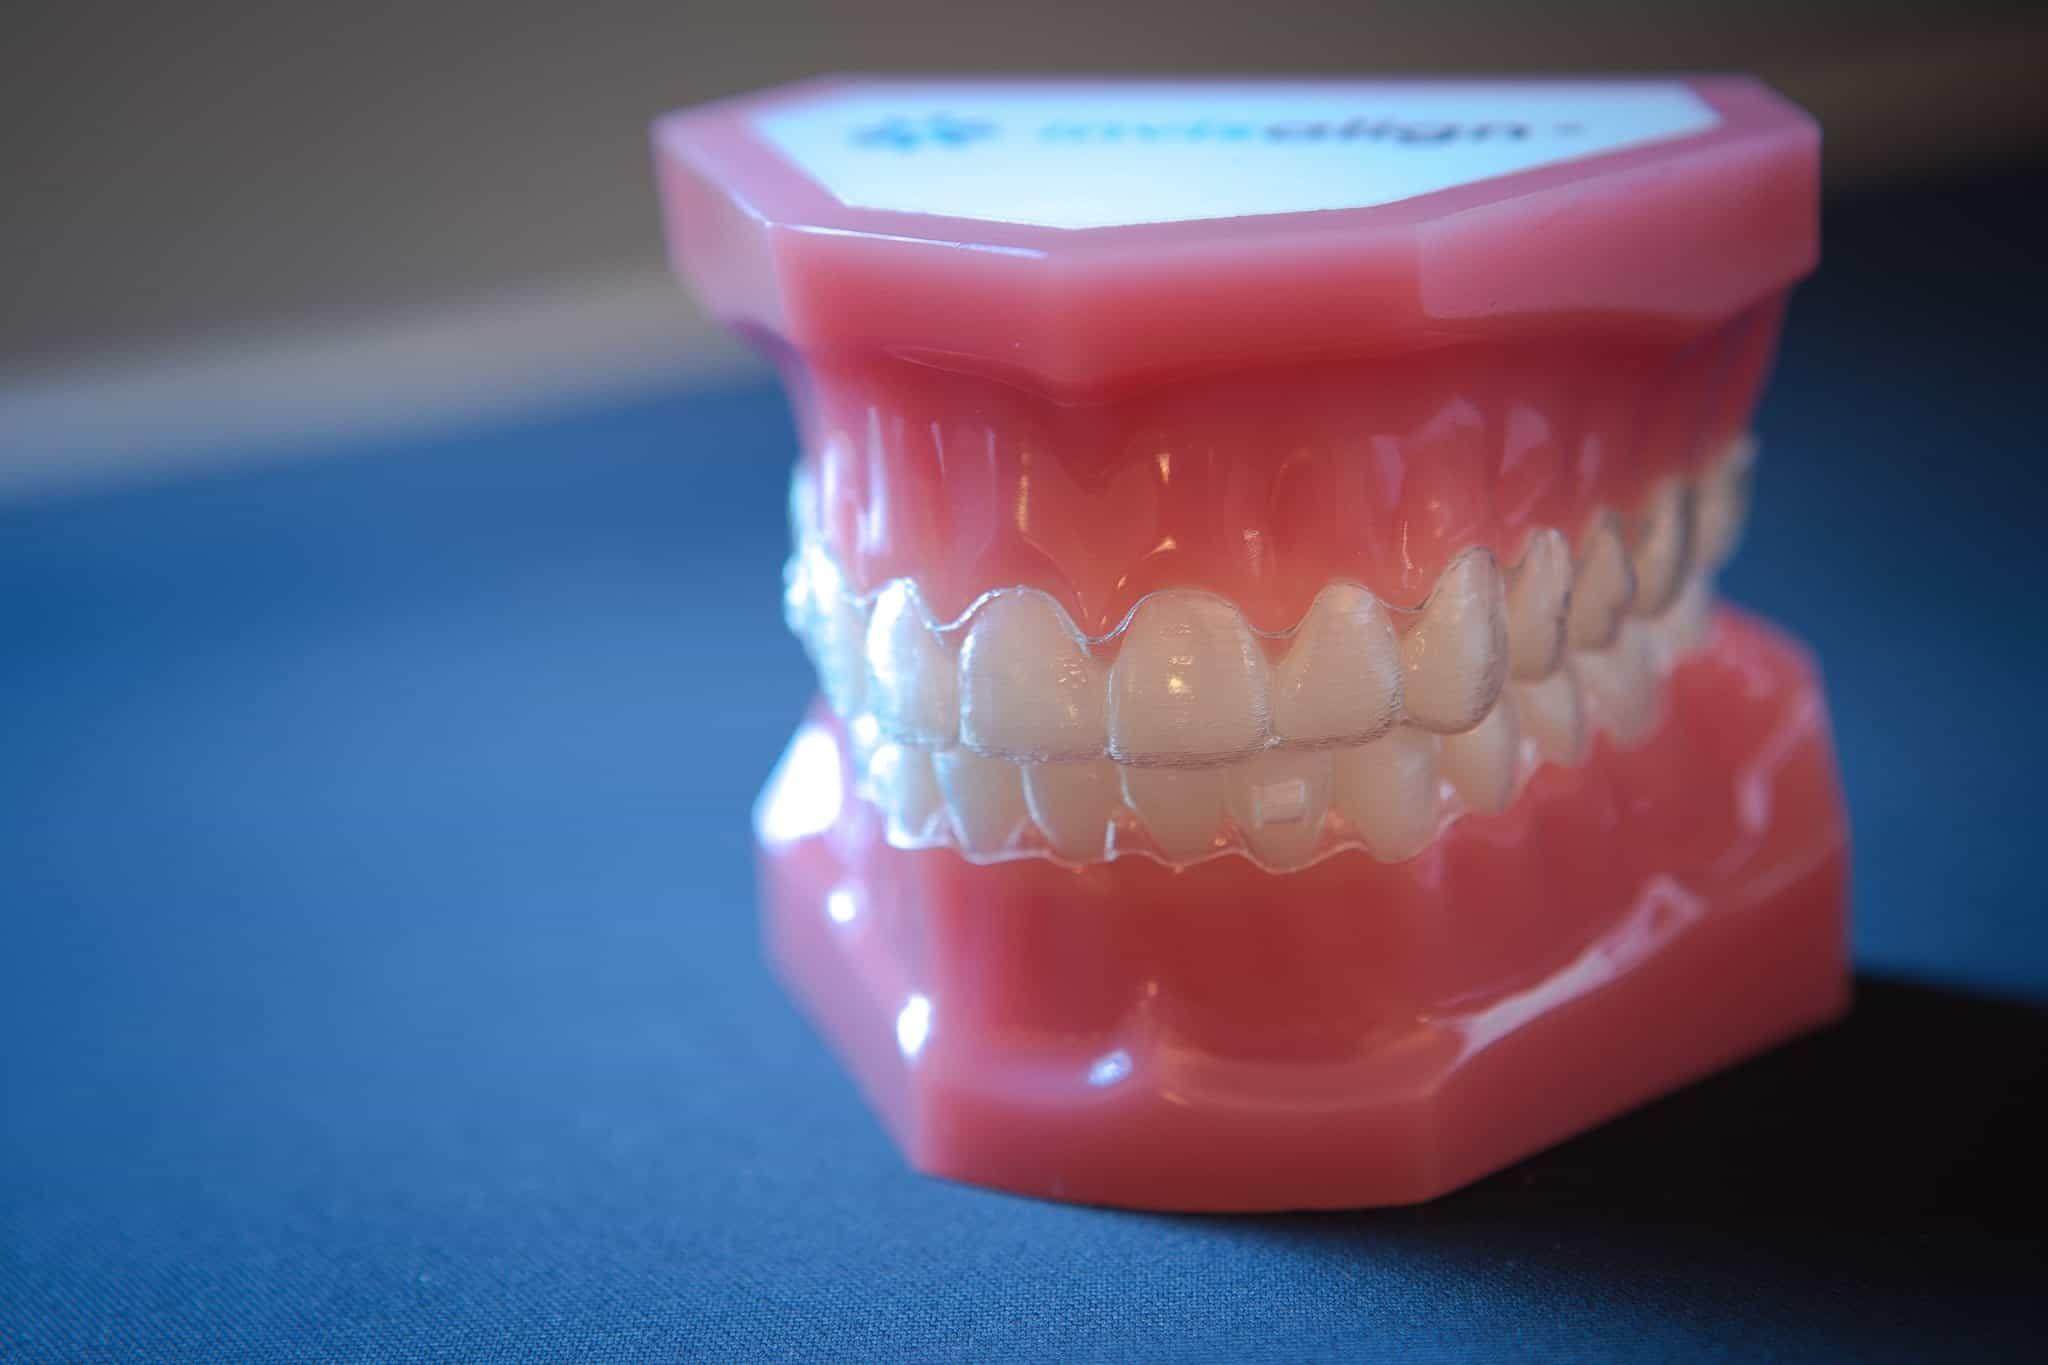 Appel Orthodontics Philadelphia Orthodontics Invisalign 1 of 7 - The Appel Orthodontics Blog